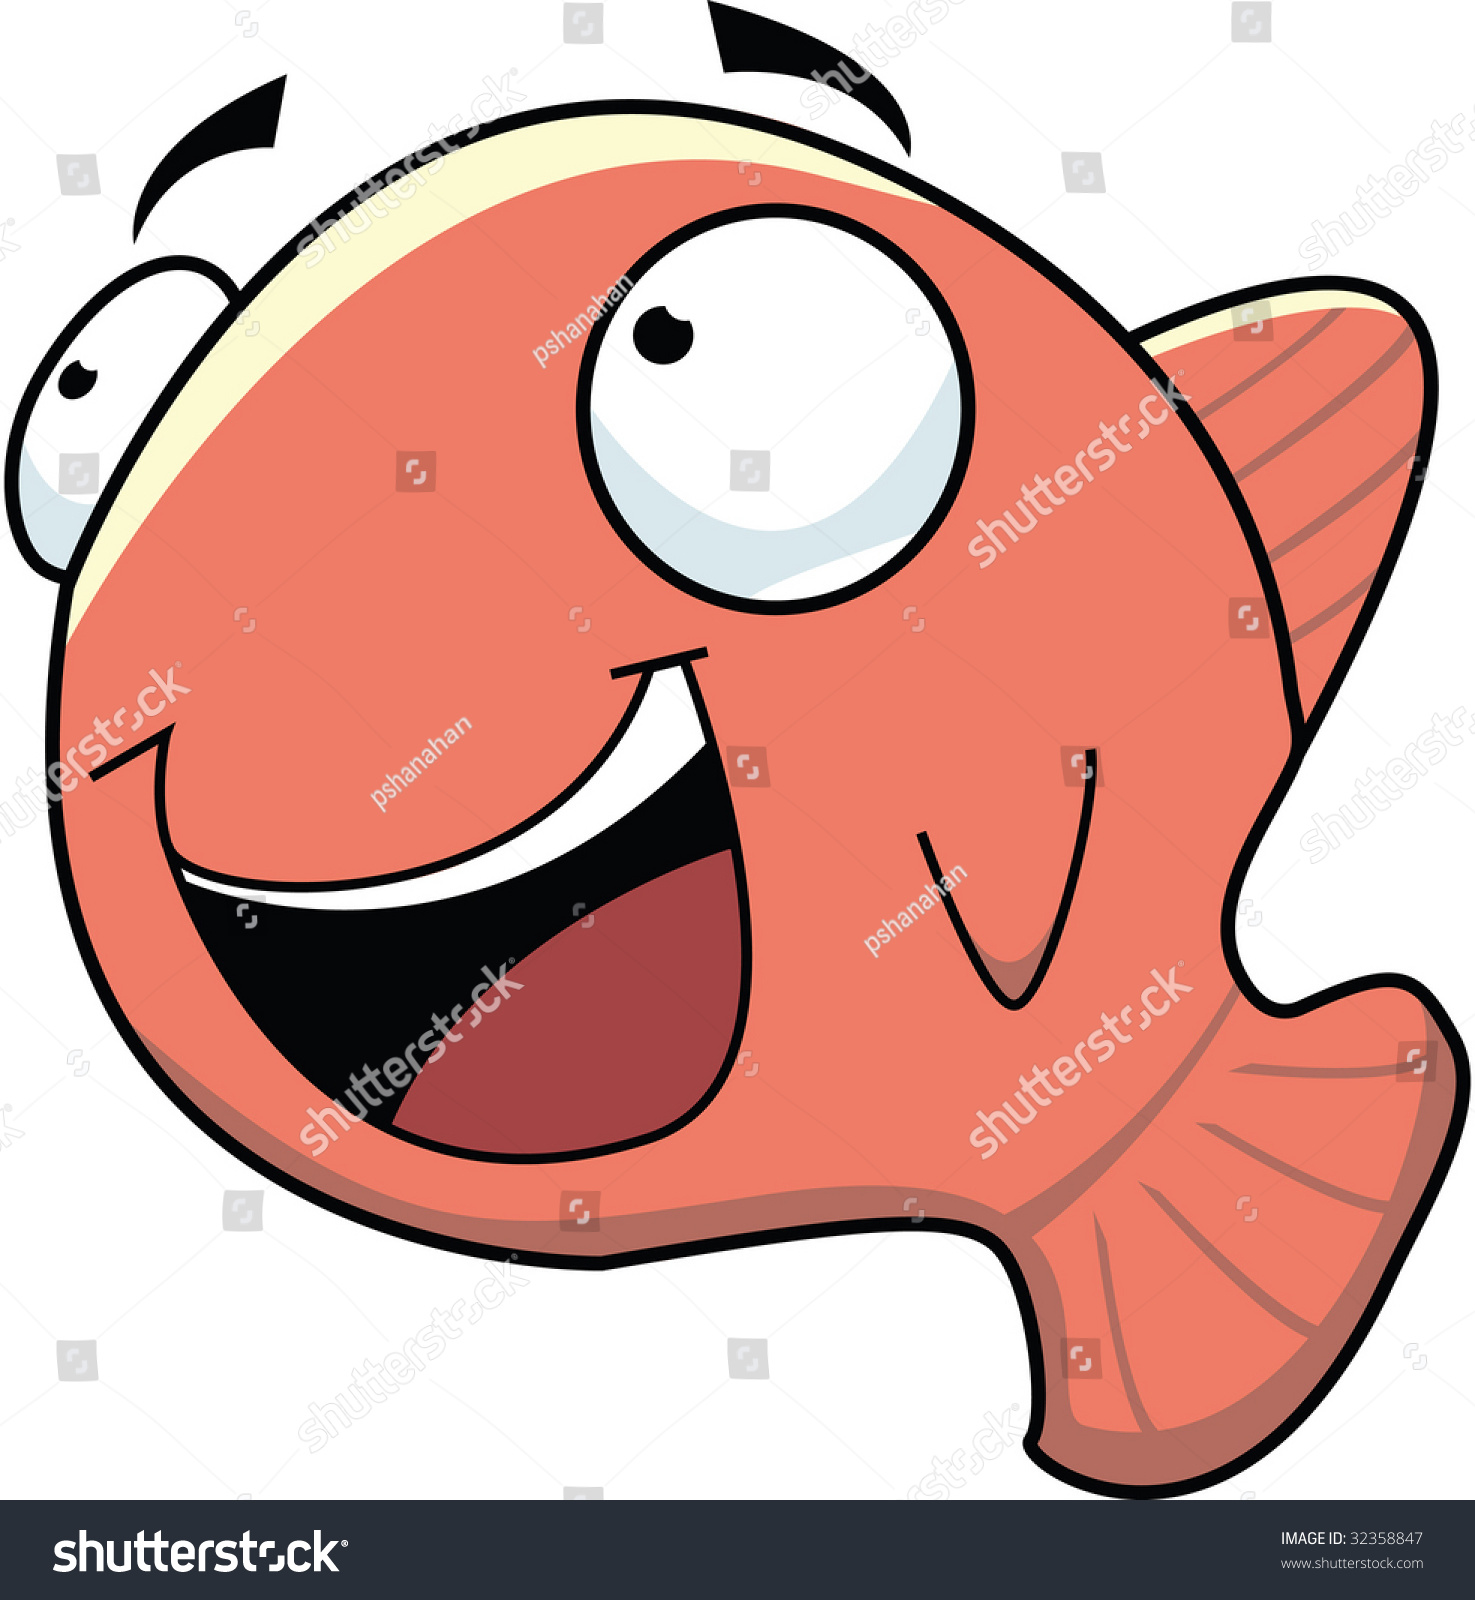 Clip Art Vector Image Of A Goldfish - 32358847 : Shutterstock